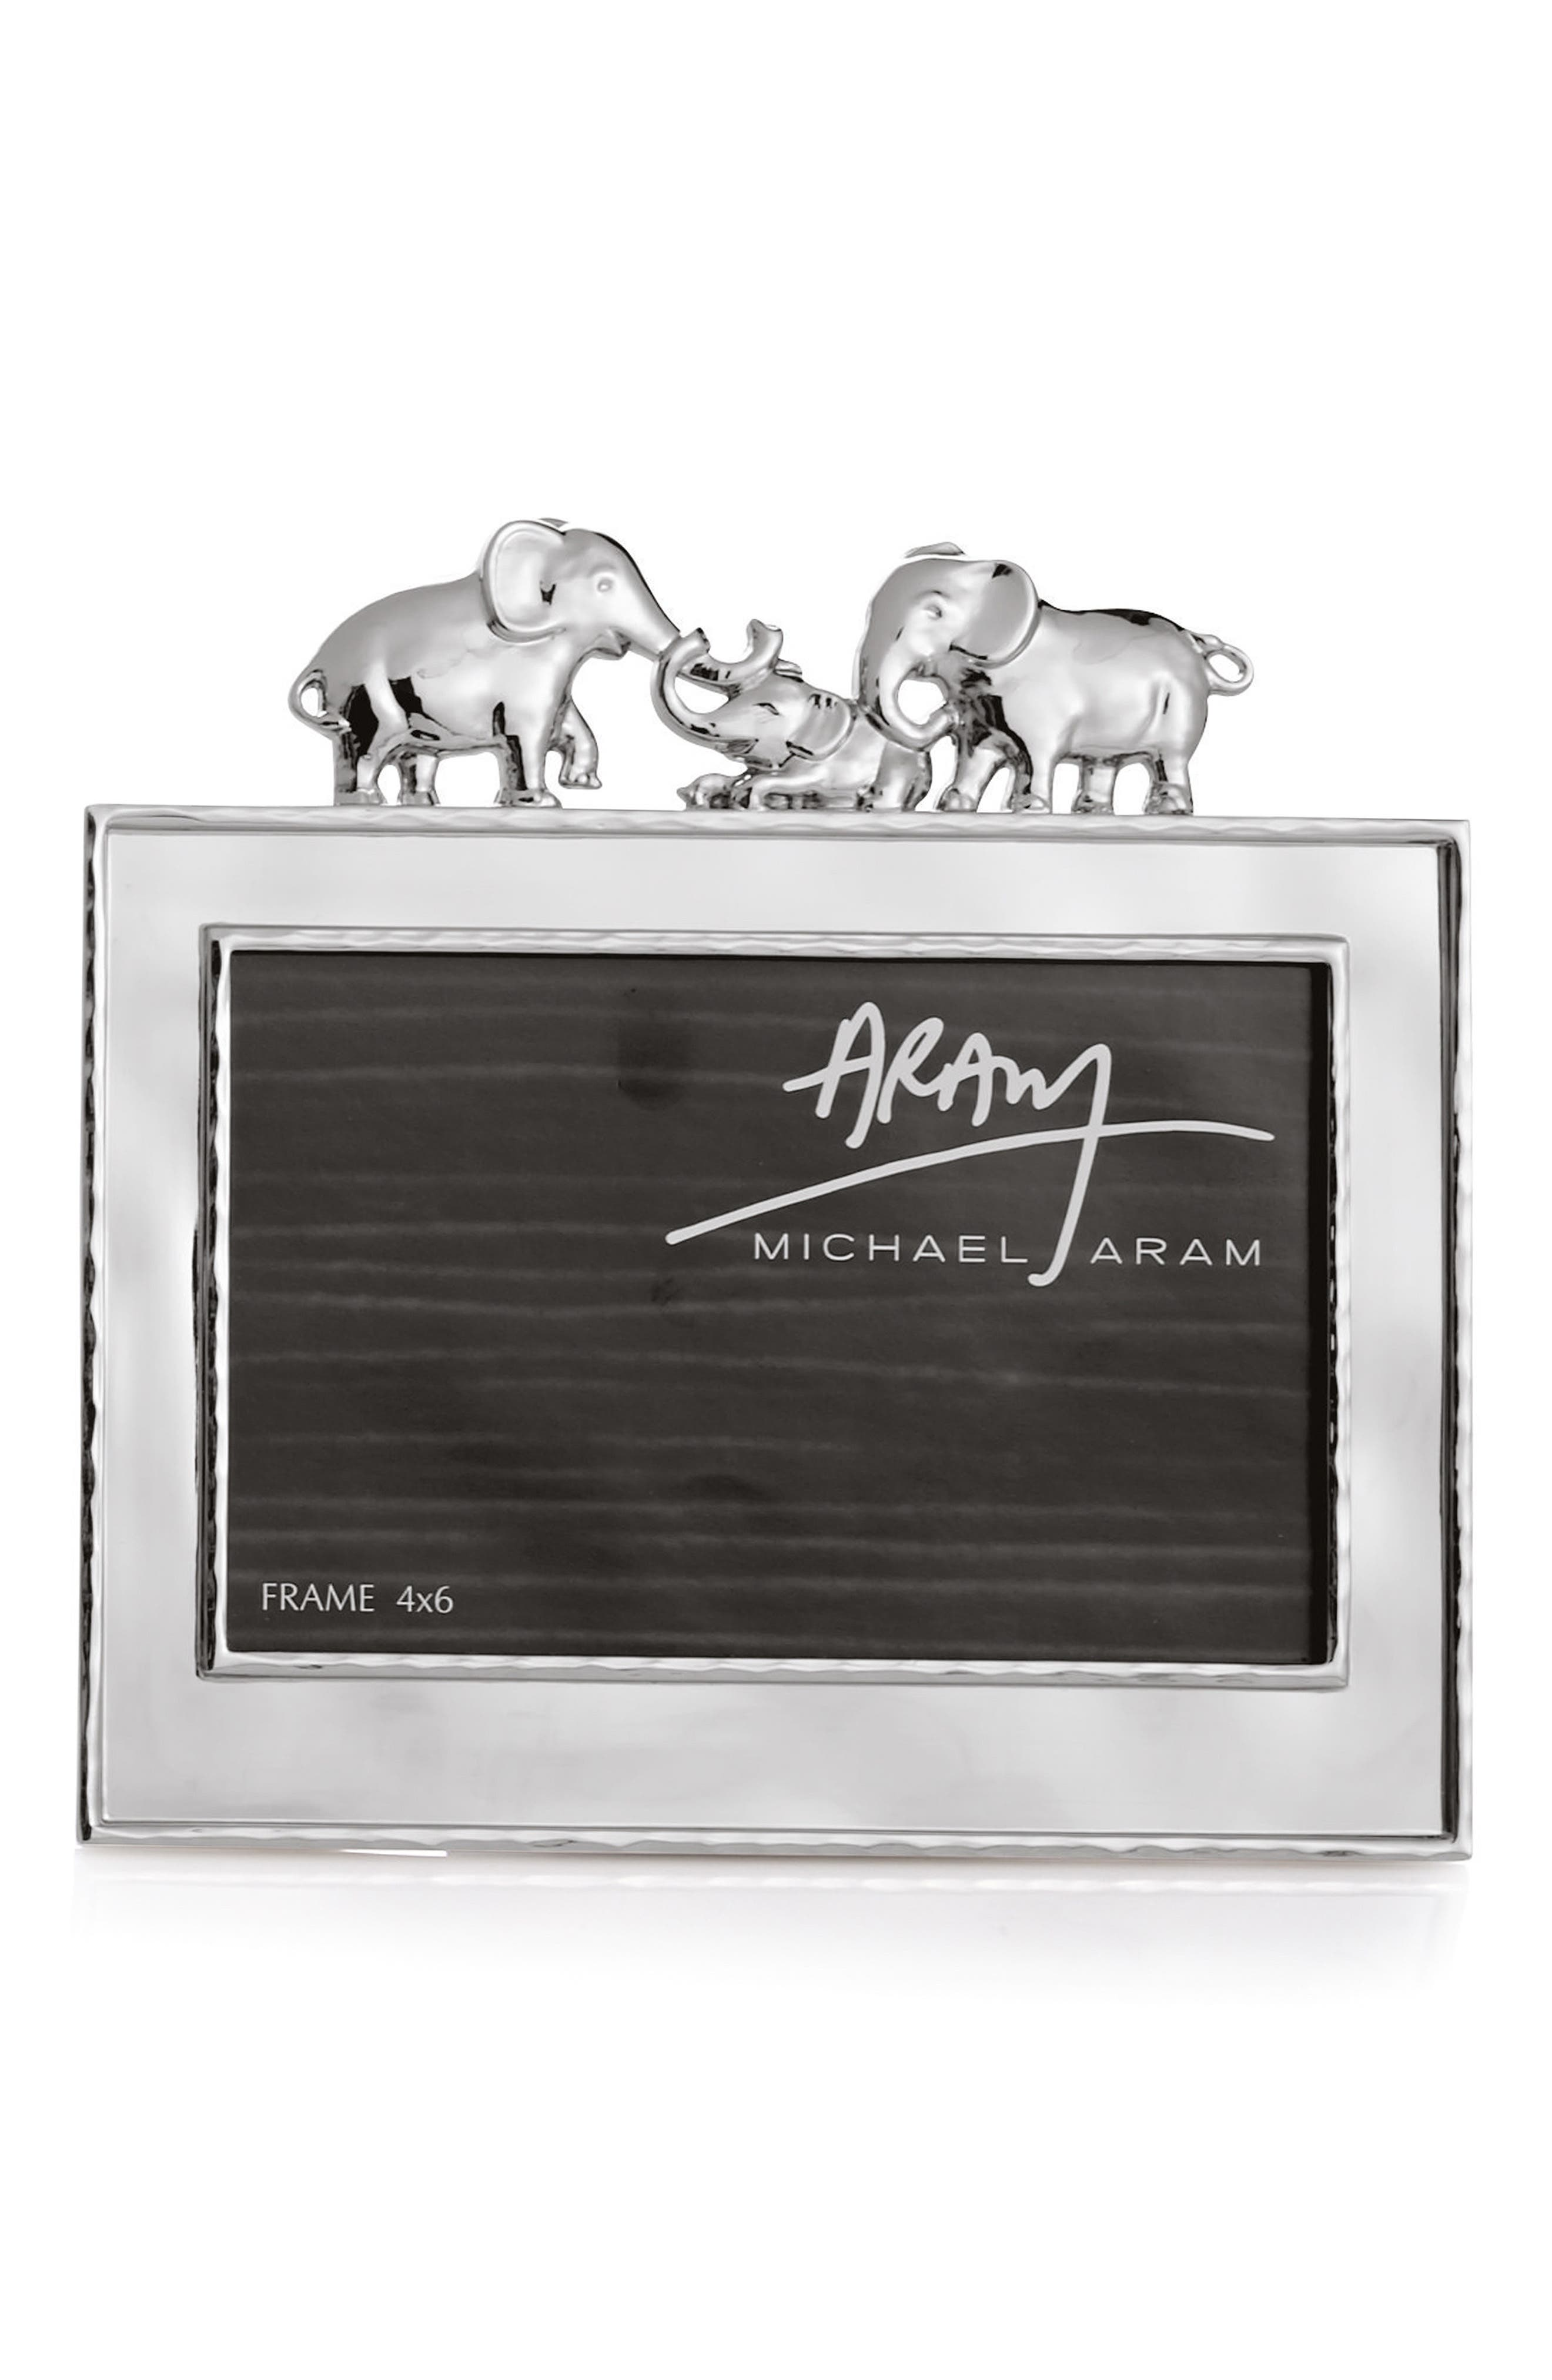 Main Image - Michael Aram Elephants Picture Frame